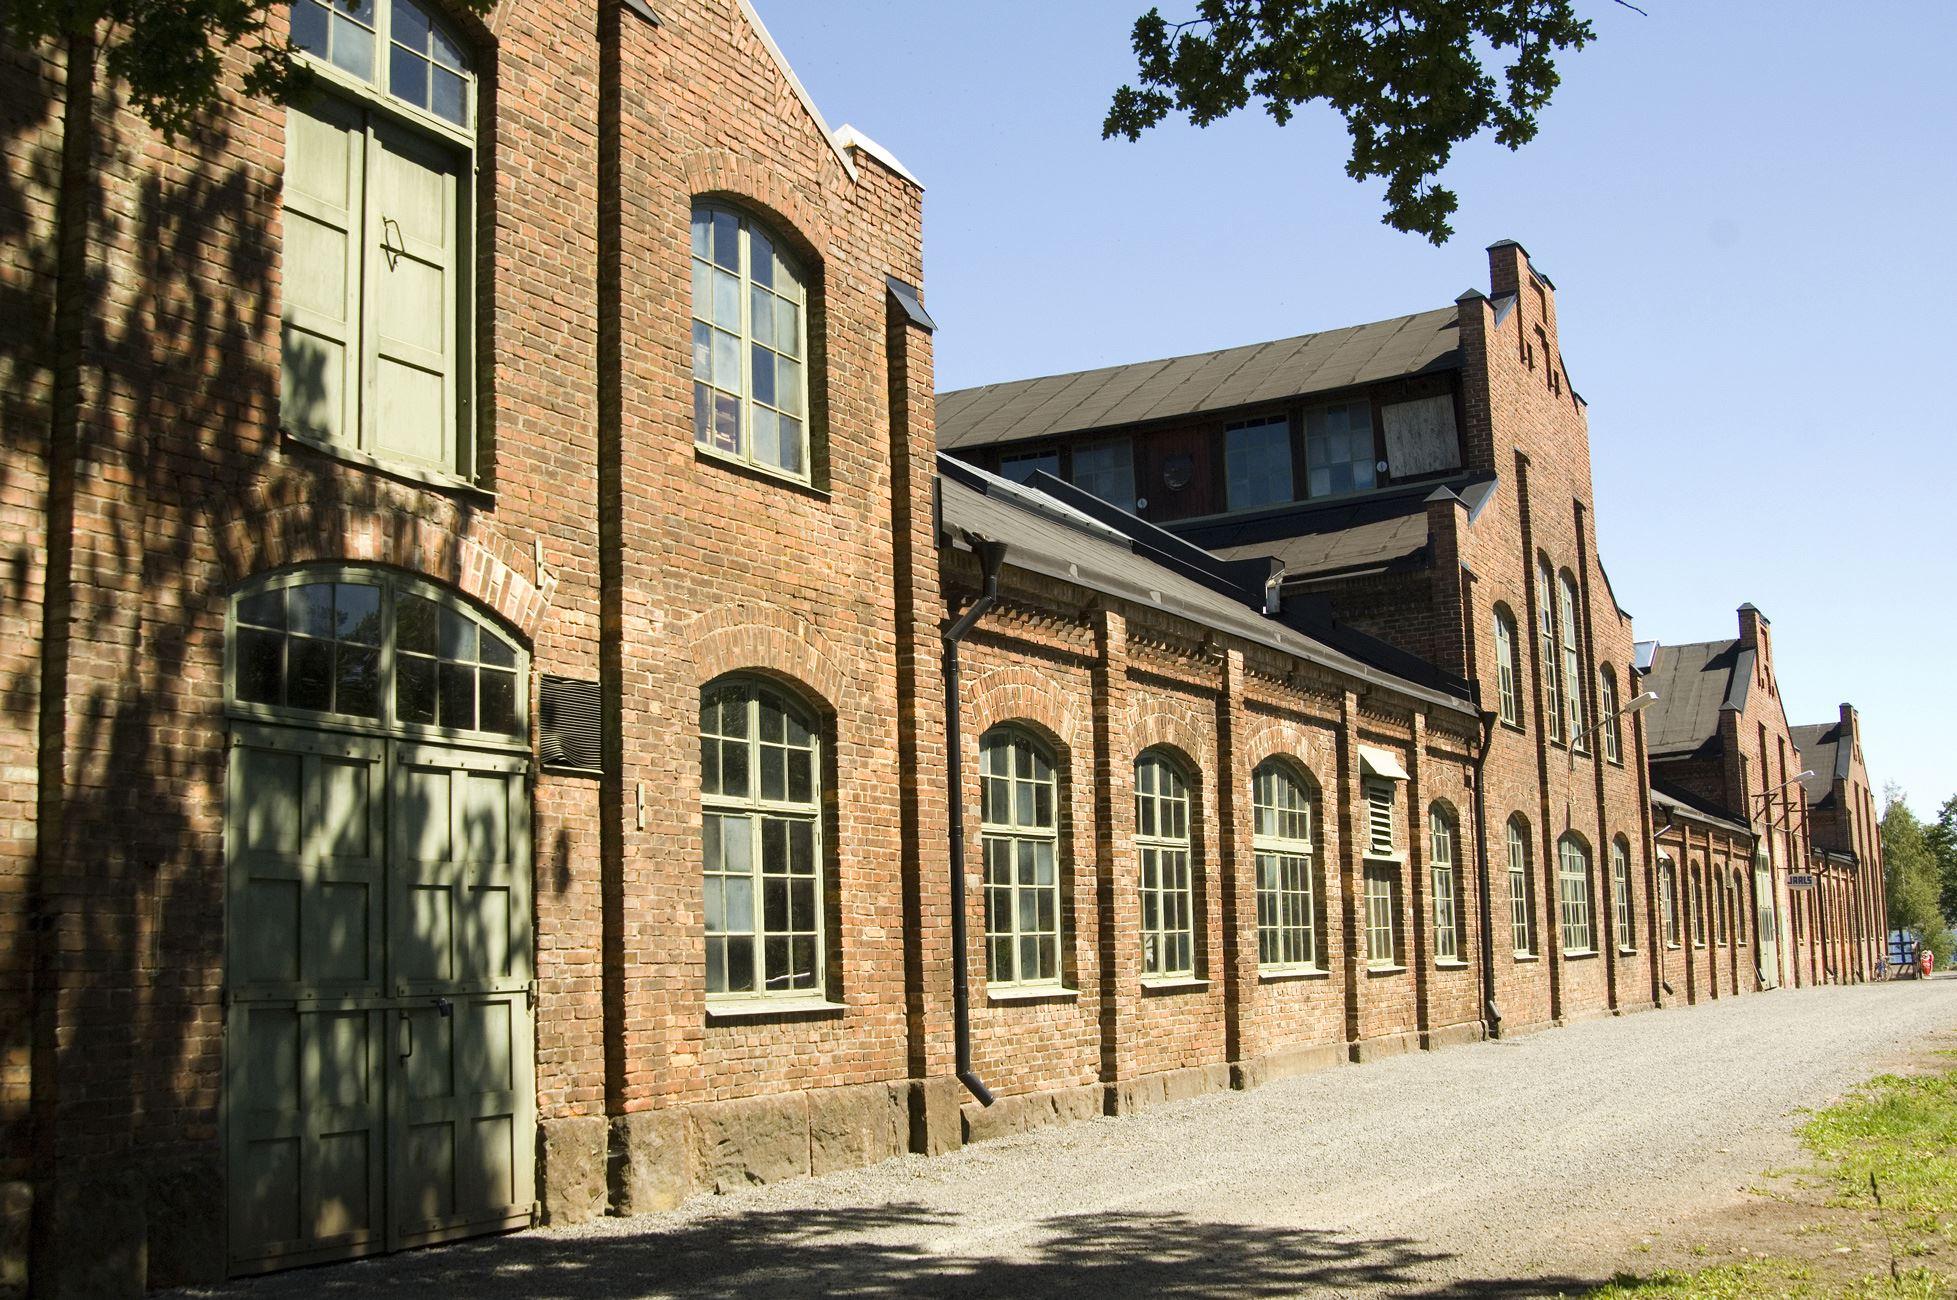 Smålandsbilder.se,  © Smålandsbilder.se, Åminne Bruksmuseum